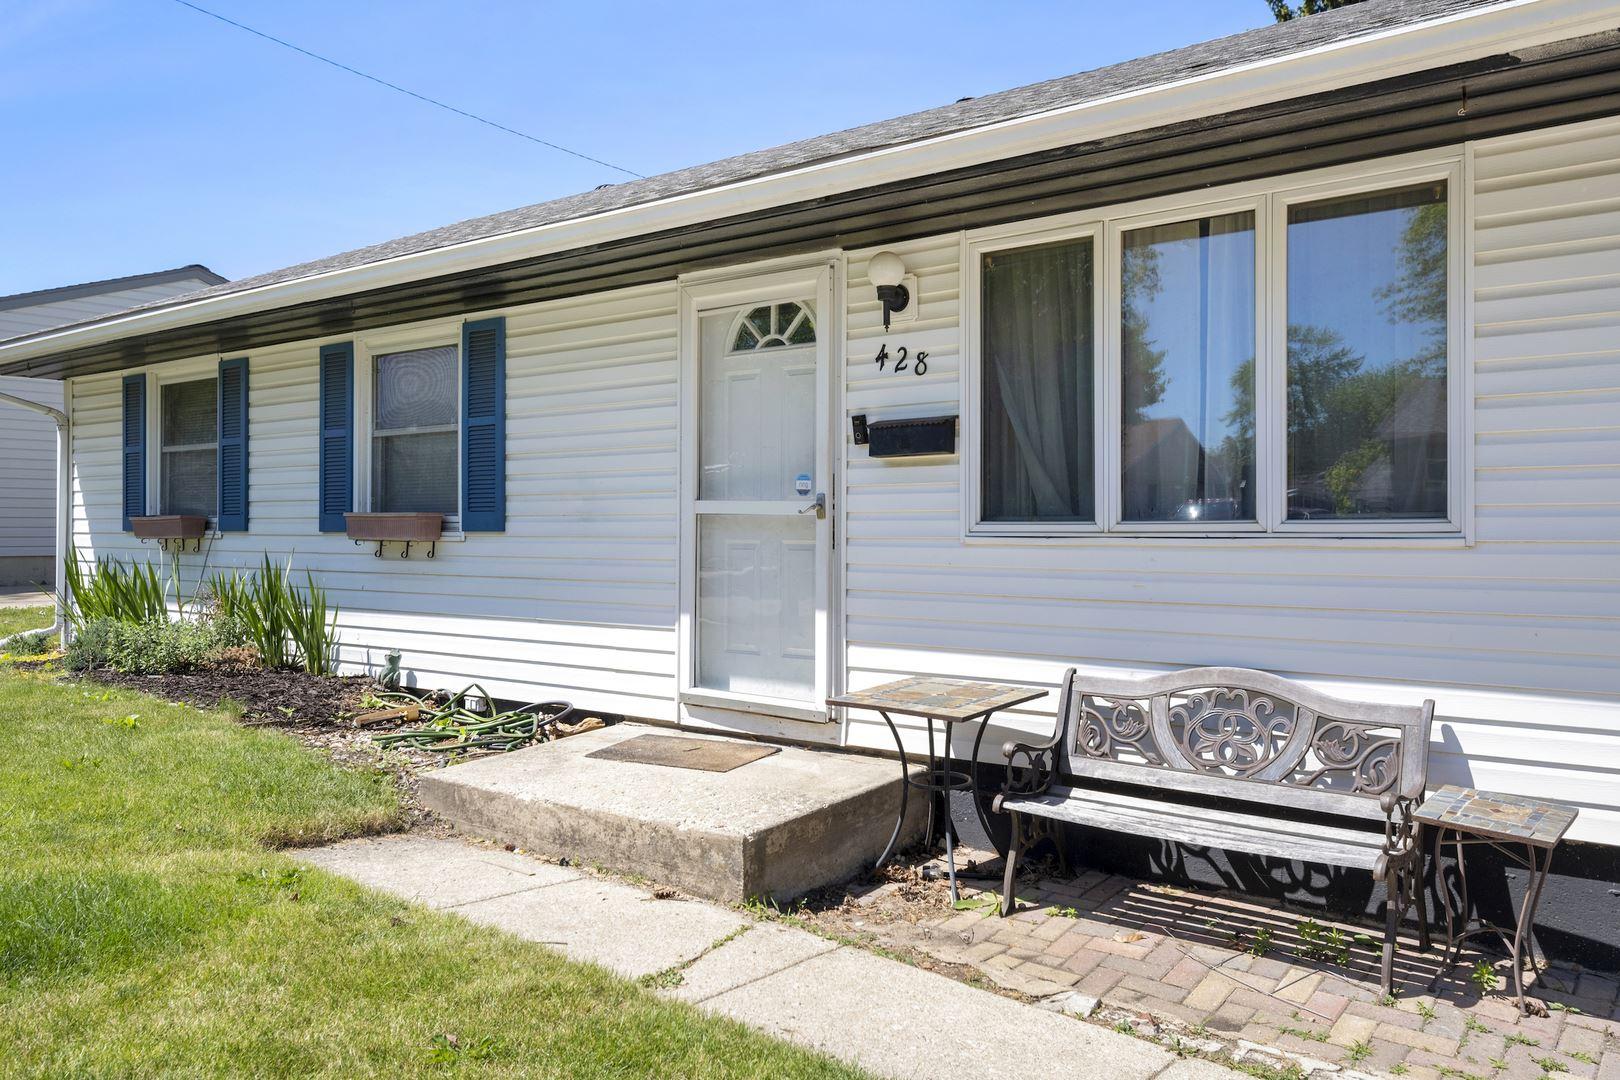 Photo of 428 Kingston Drive, Romeoville, IL 60446 (MLS # 11110781)